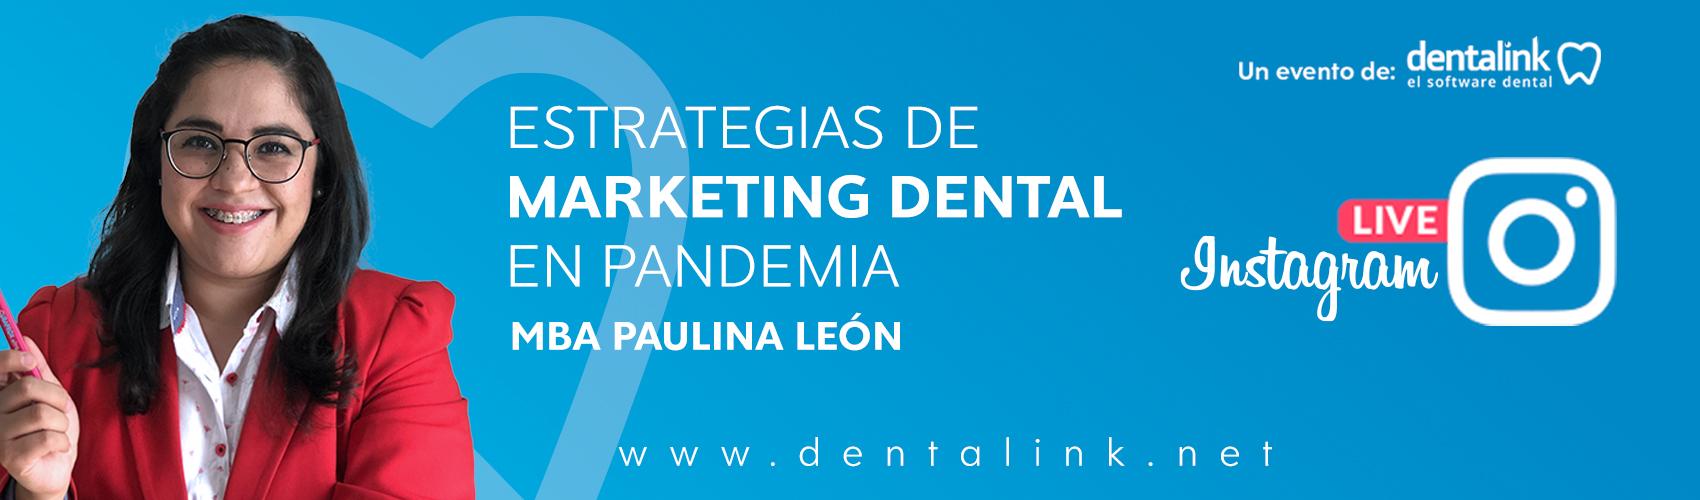 Instagram Live: Estrategias de Marketing dental en Pandemia